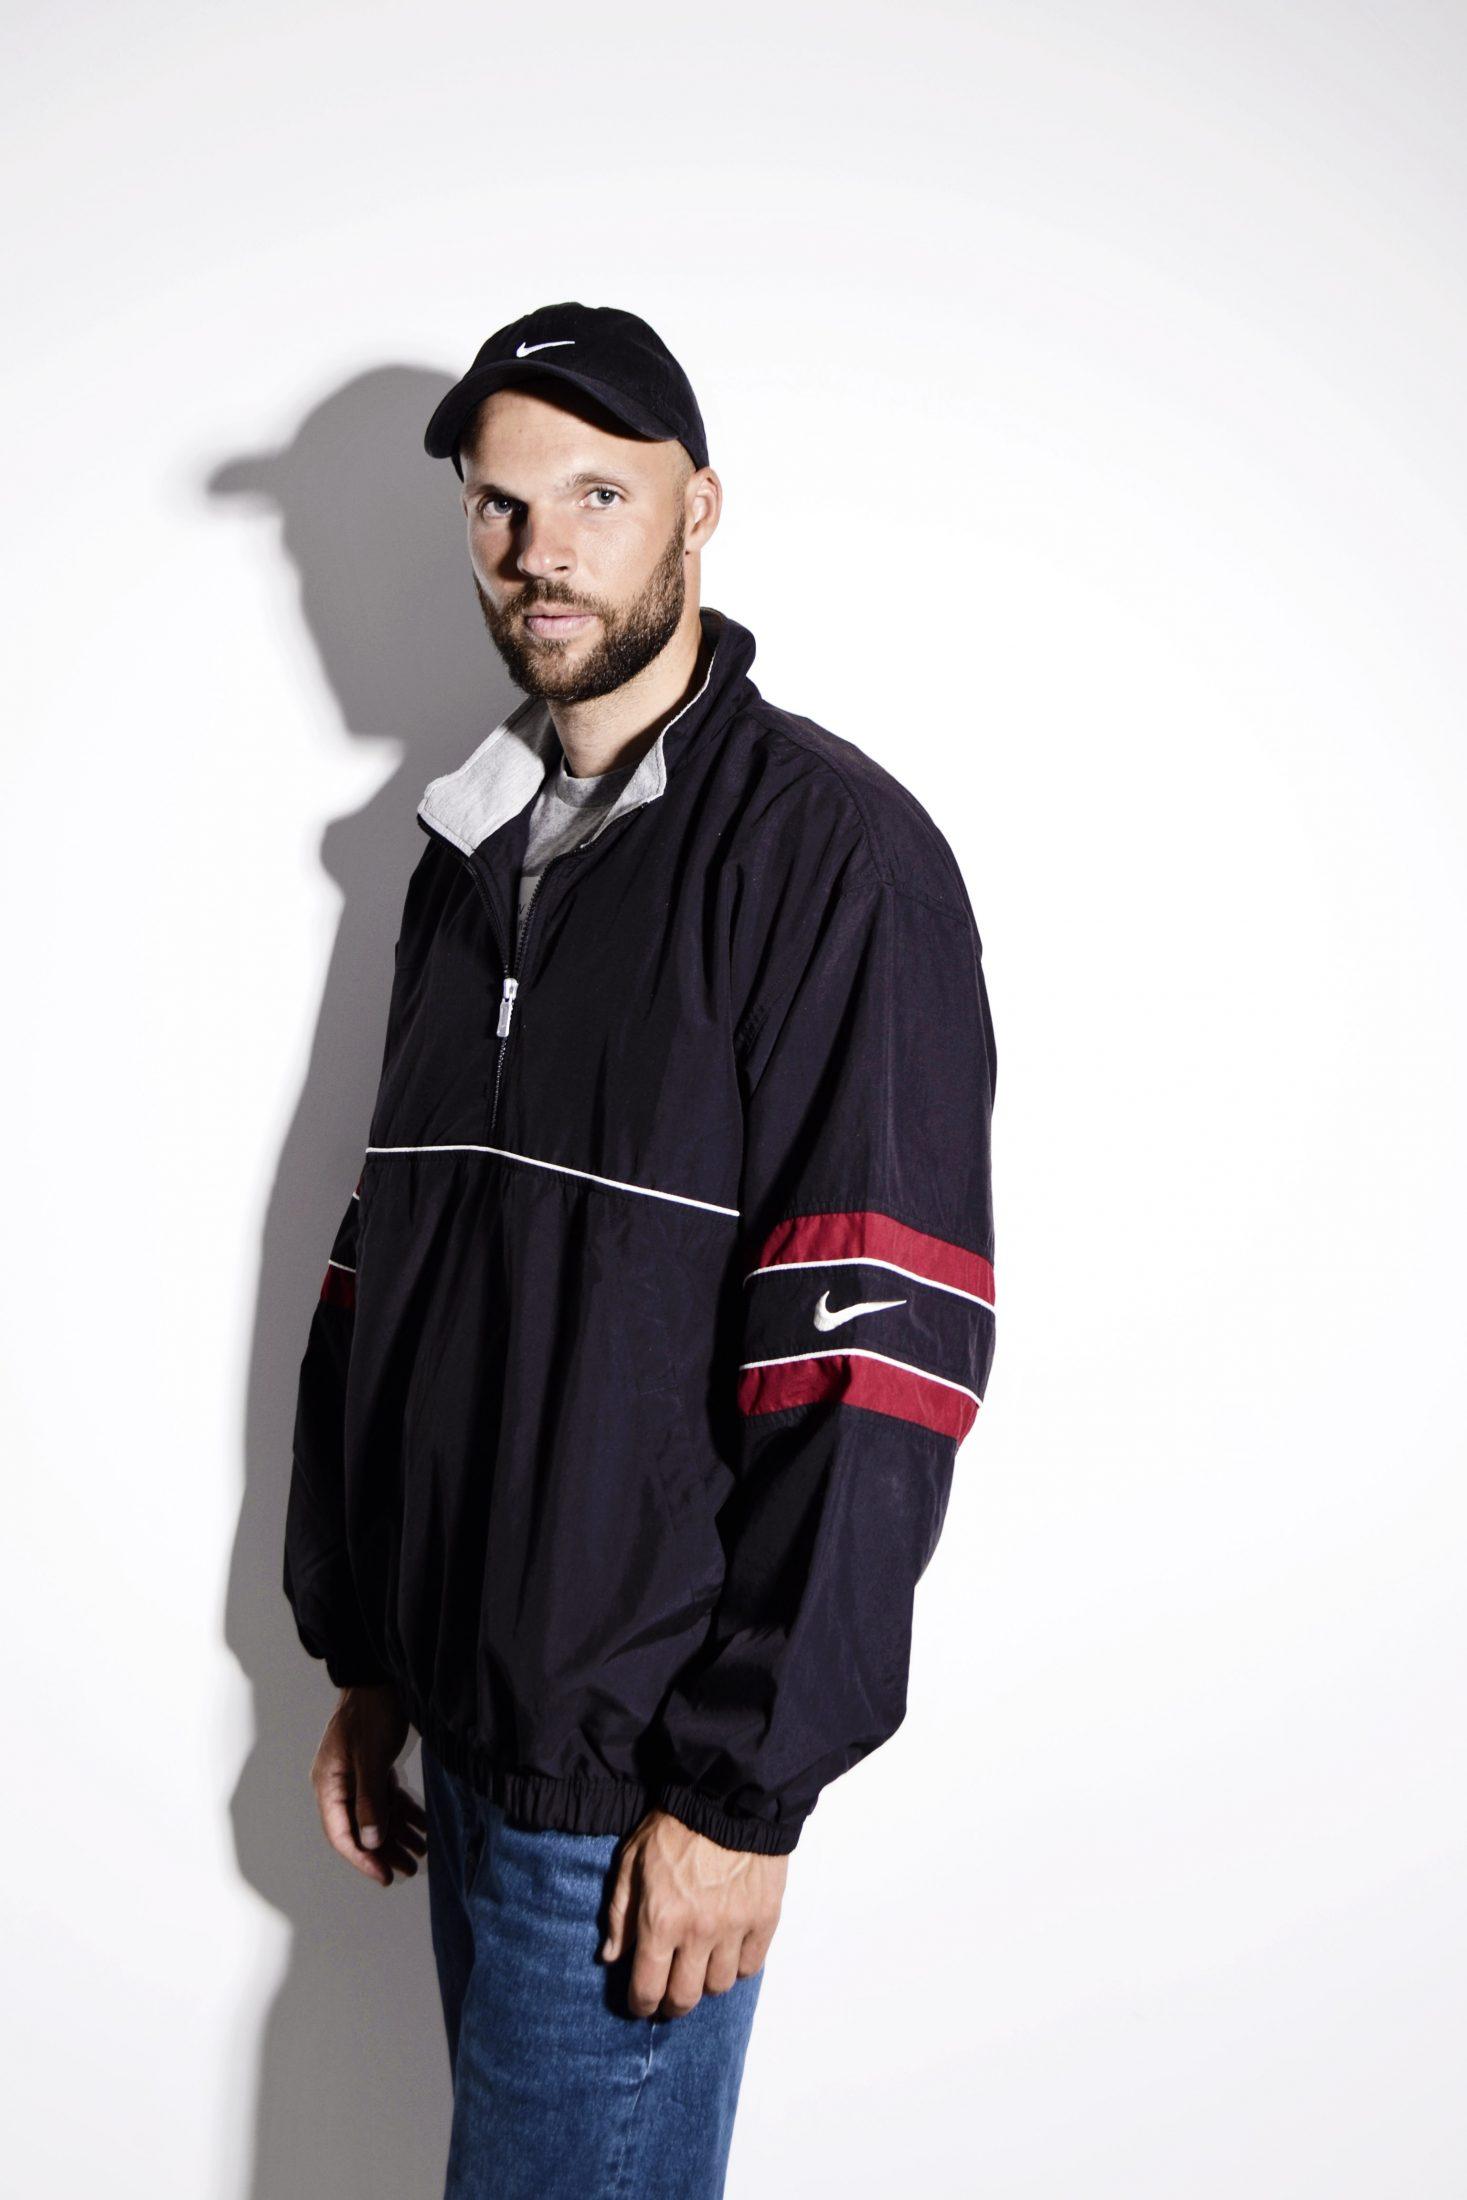 1c333006c13 Vintage red sport jacket men | HOT MILK 90's streetwear online